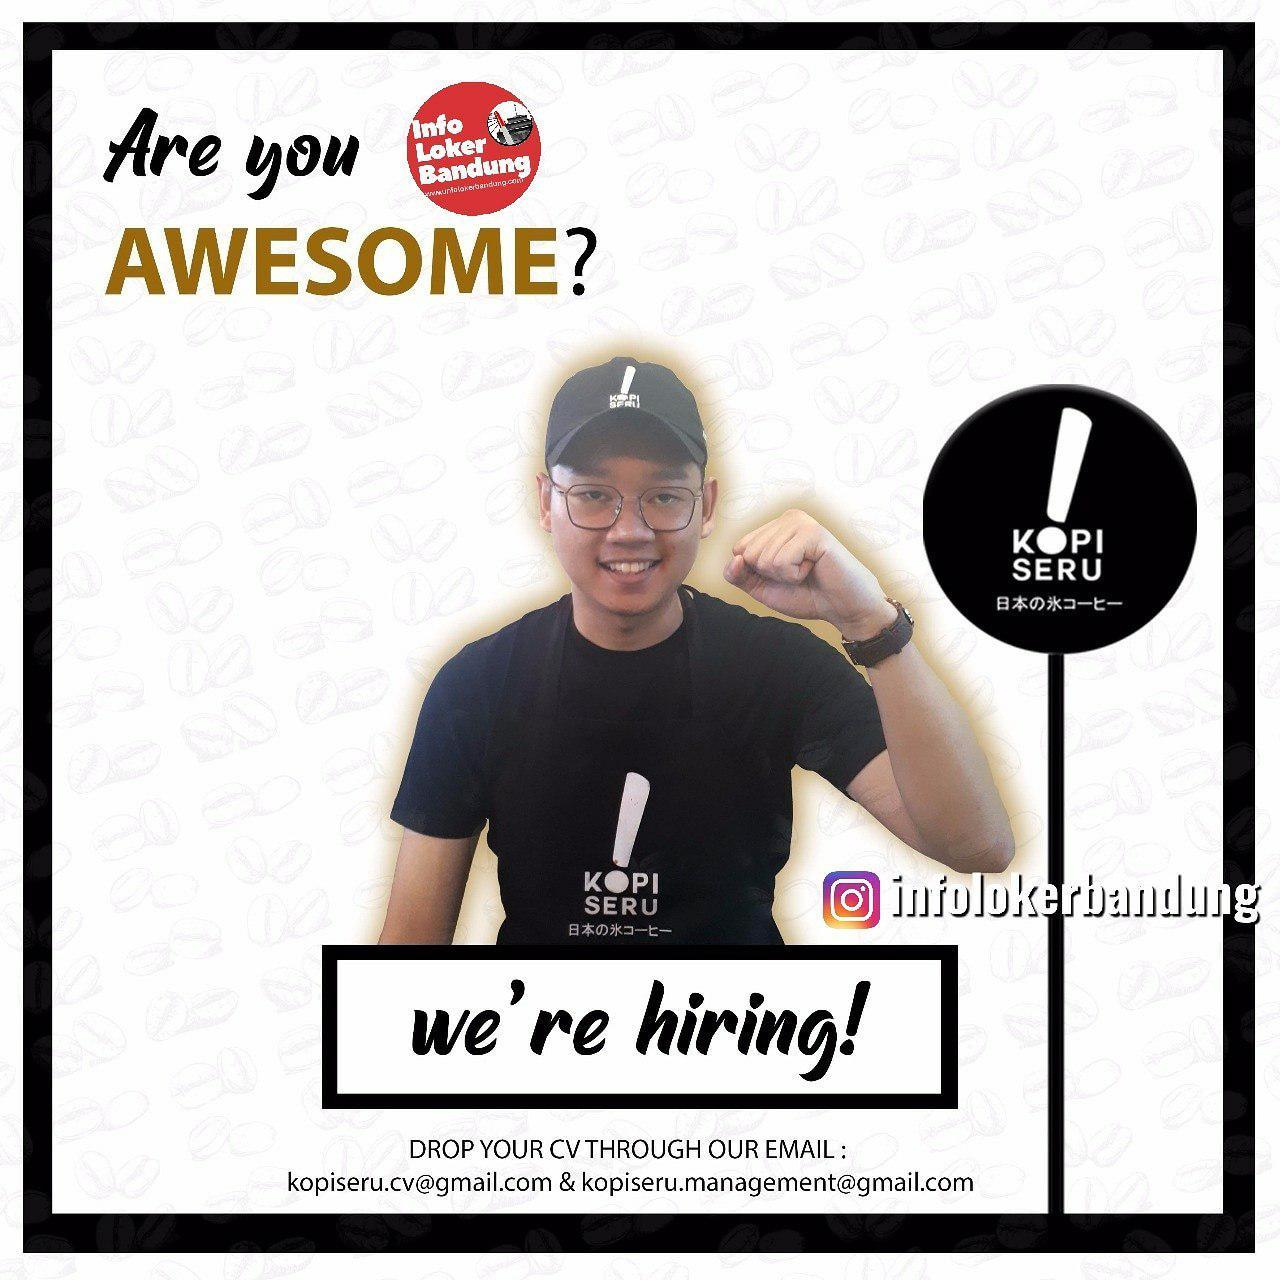 Lowongan Kerja Barista Kopi Seru Bandung April 2019